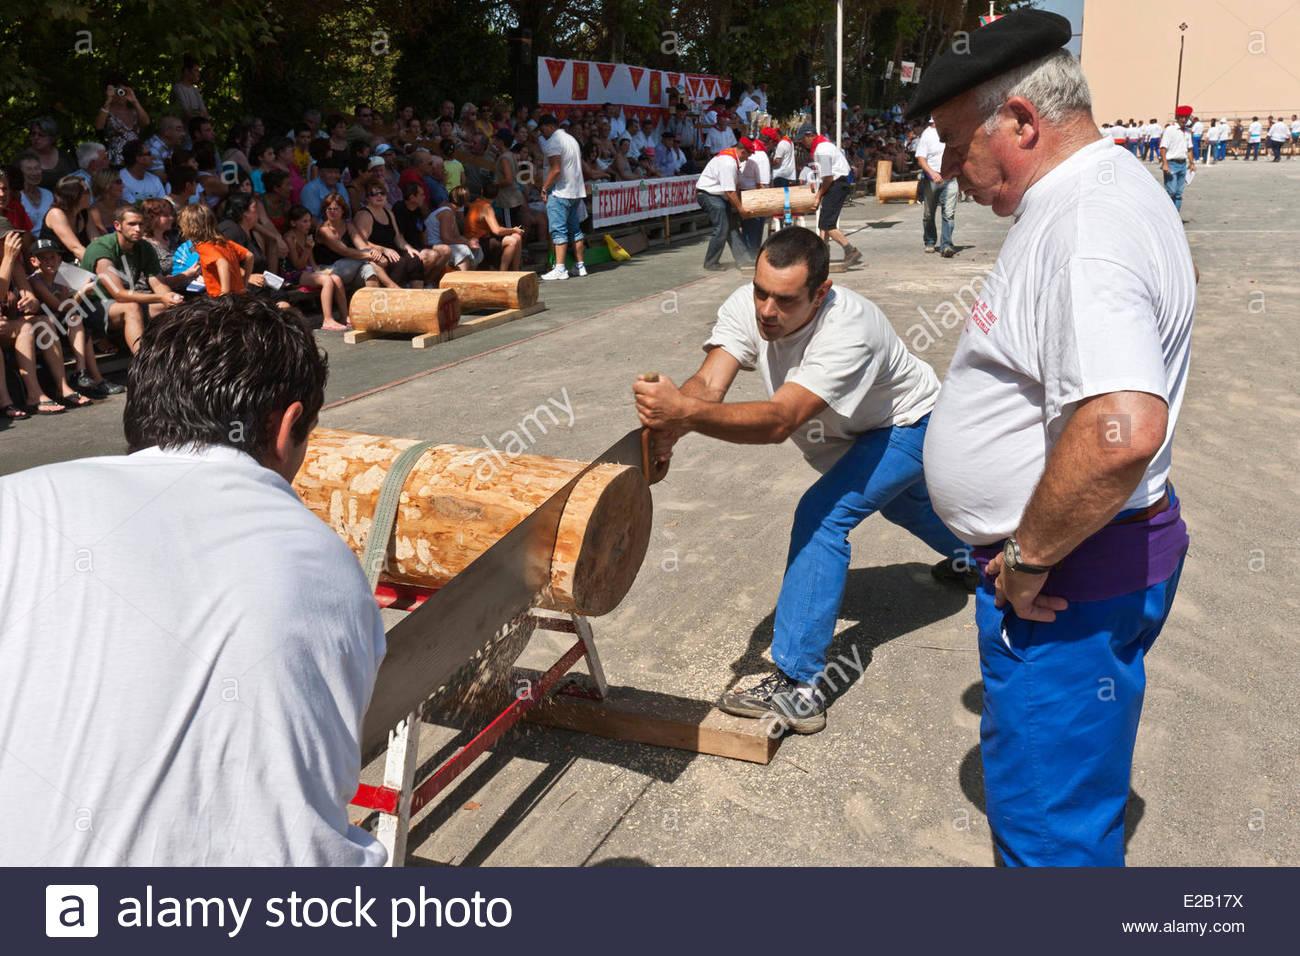 France, Pyrenees Atlantiques, Basque Country, Saint Palais, strenght Basque festival, lumberjacks, sawyers Stock Photo